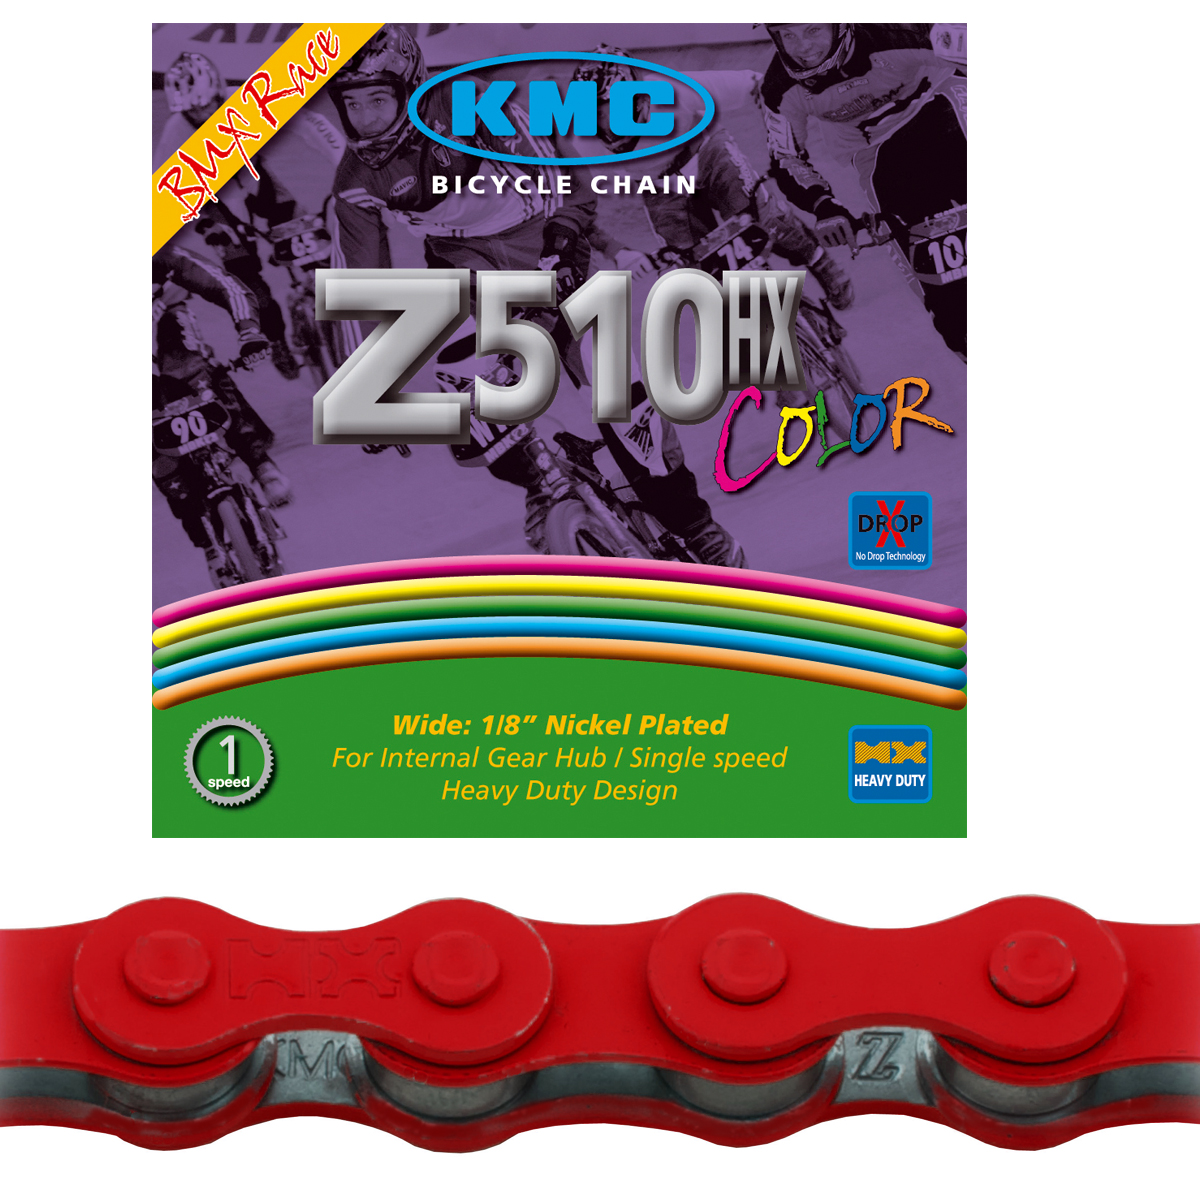 Chaine BMX KMC Z510HX Black Nano rouge 112 maillons